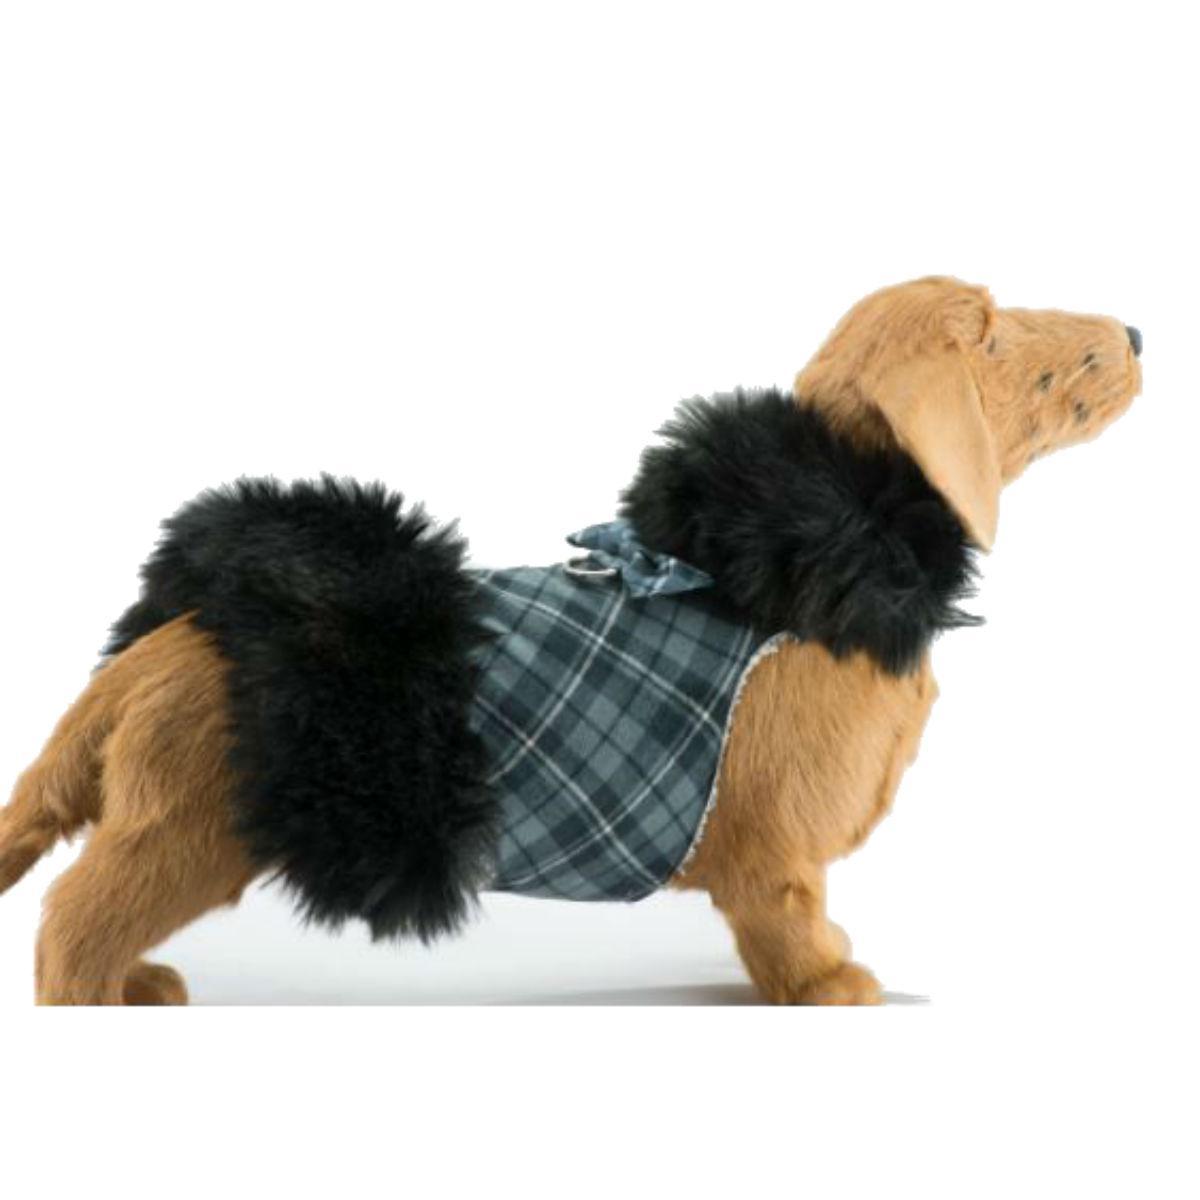 Susan Lanci Scotty Plaid Fur Dog Coat - Charcoal with Black Fox